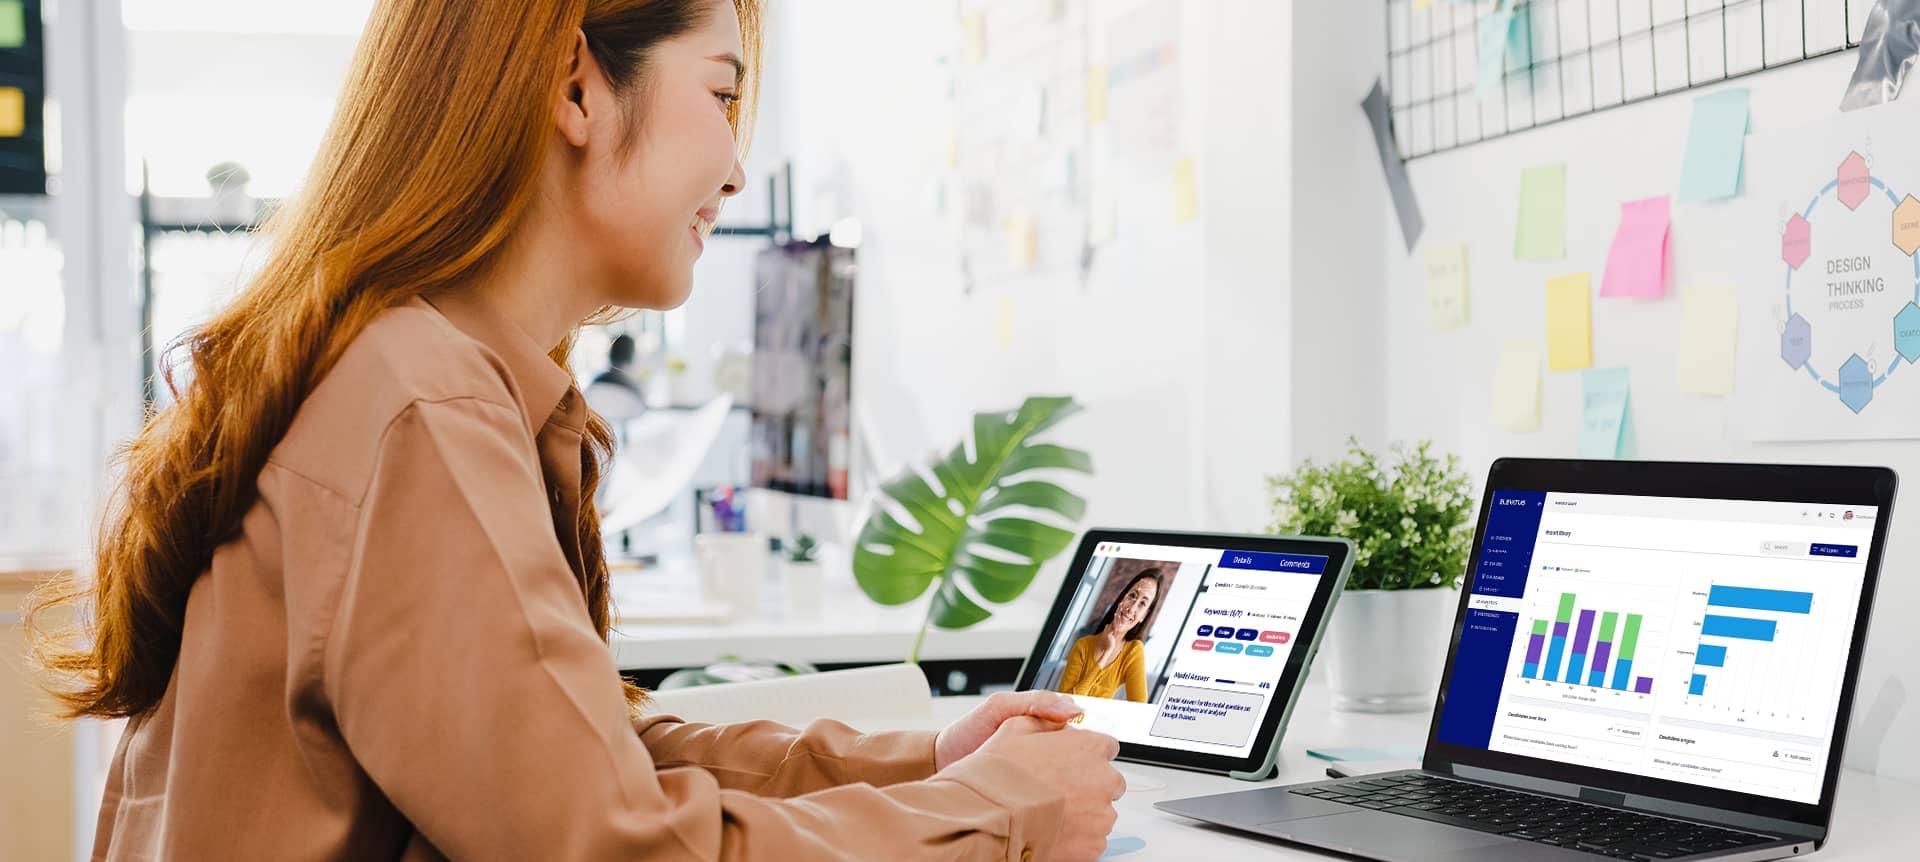 A female employee reading analytics on EVA-REC